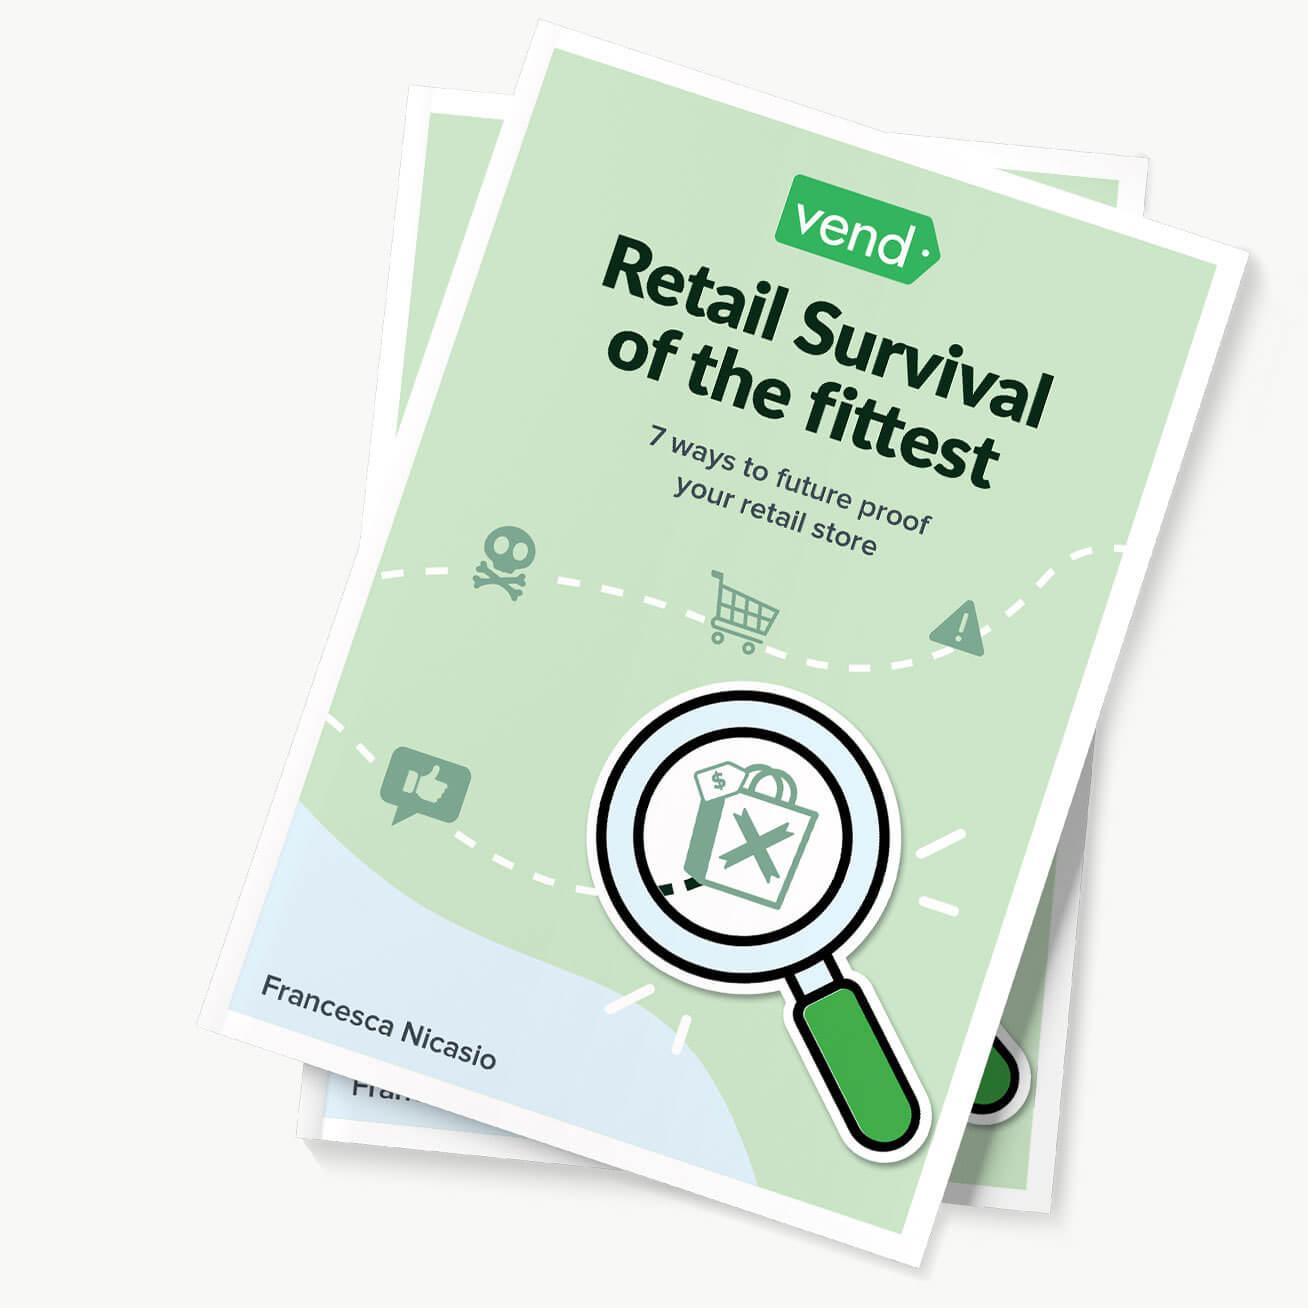 Retail Survival